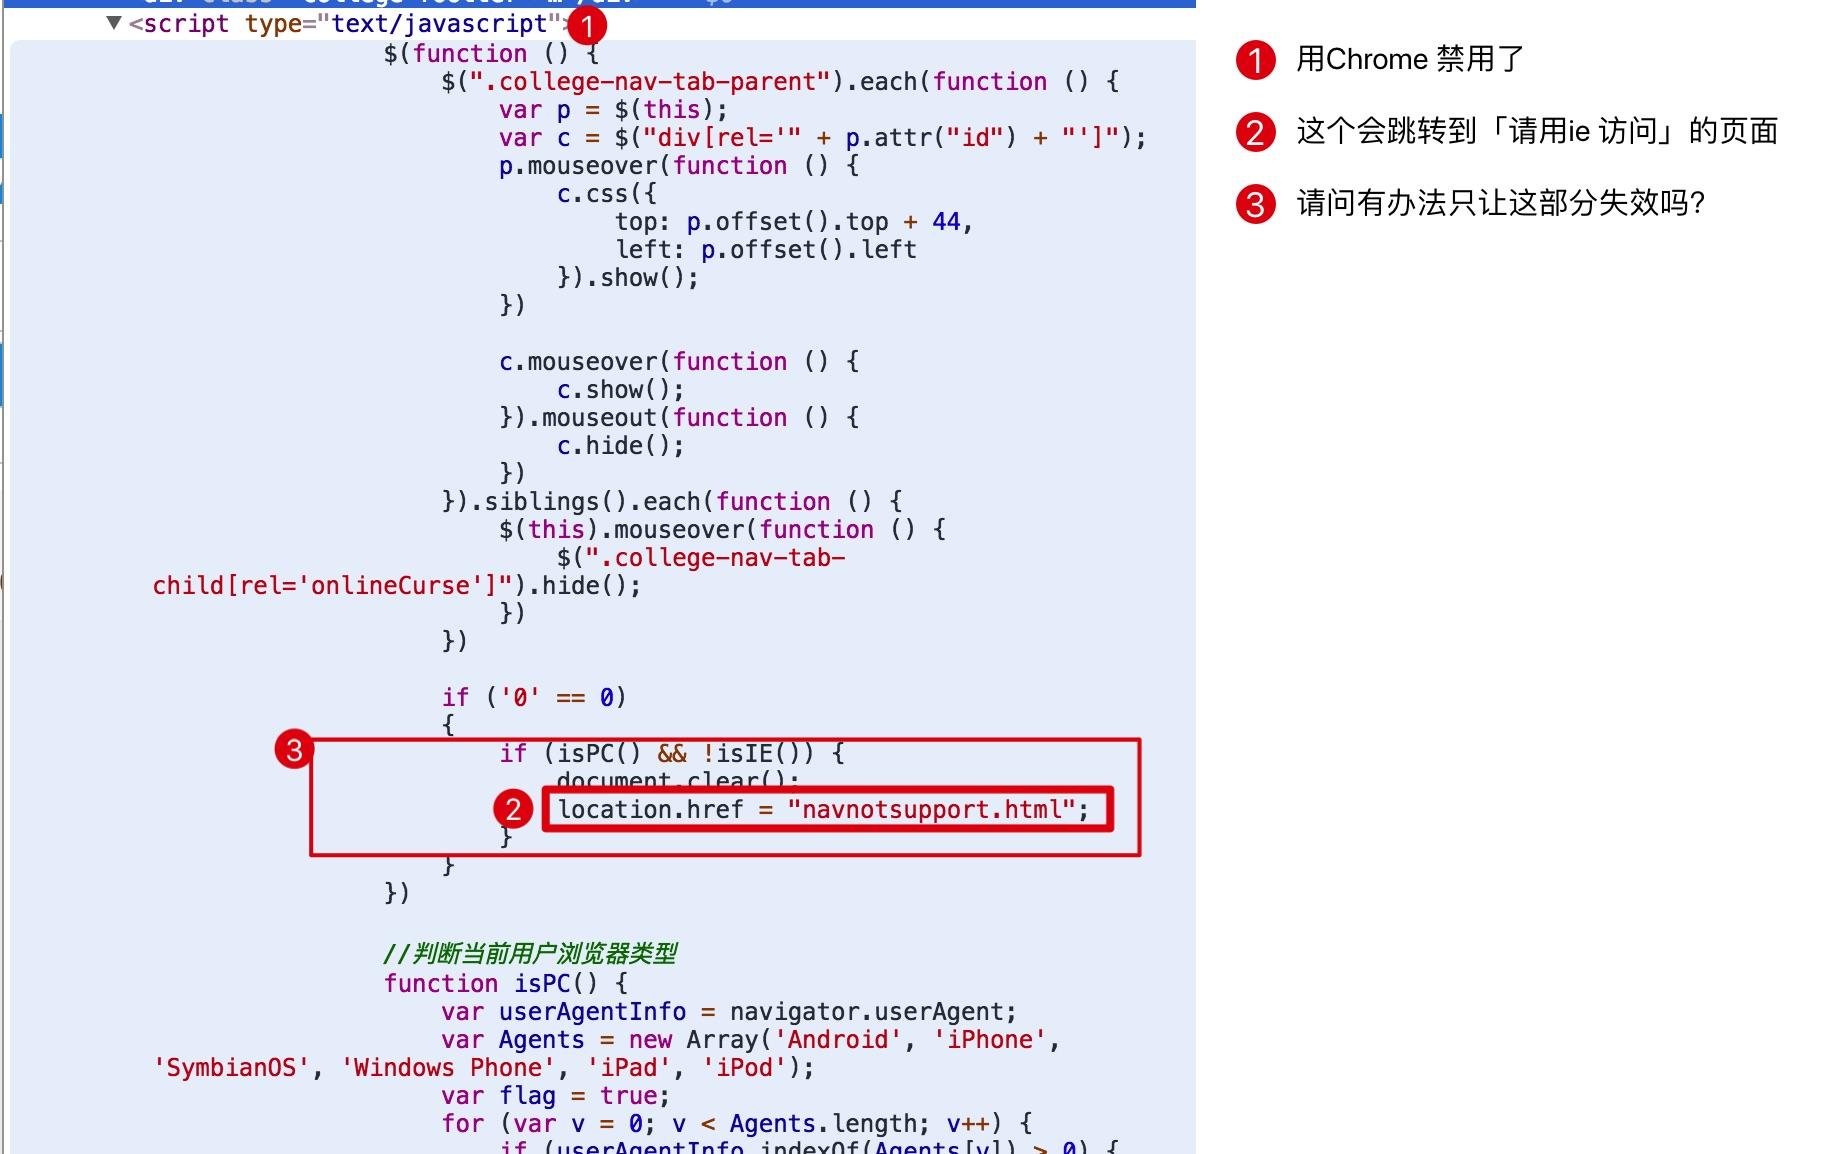 Xnip2018-03-73_10-41-18.jpg